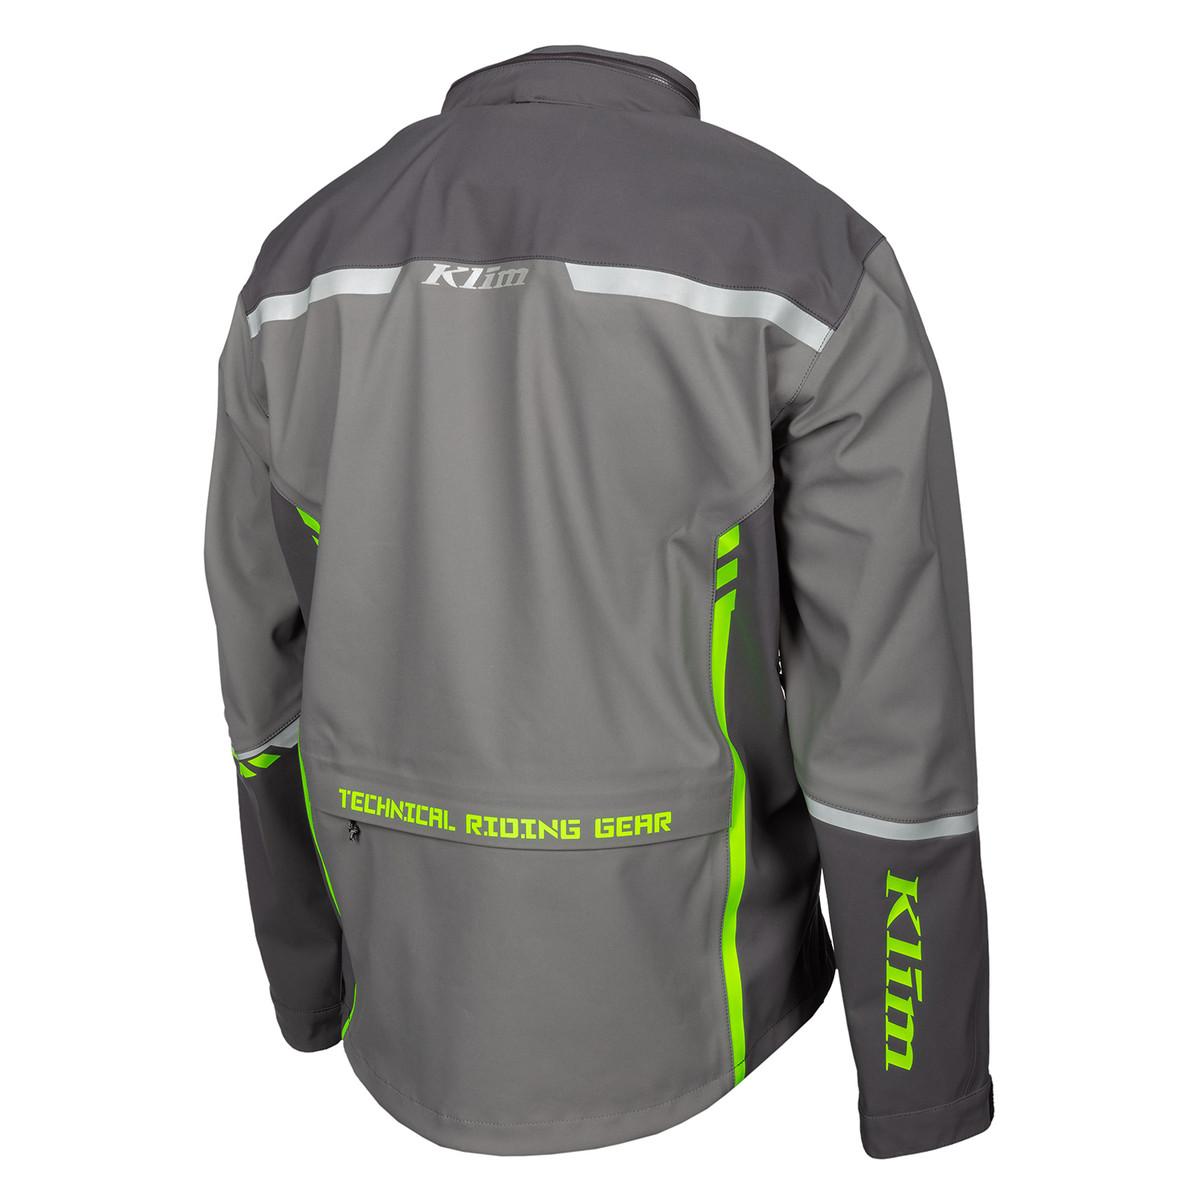 Enduro S4 Jacket Castlerock Gray - Electrik Gecko Back